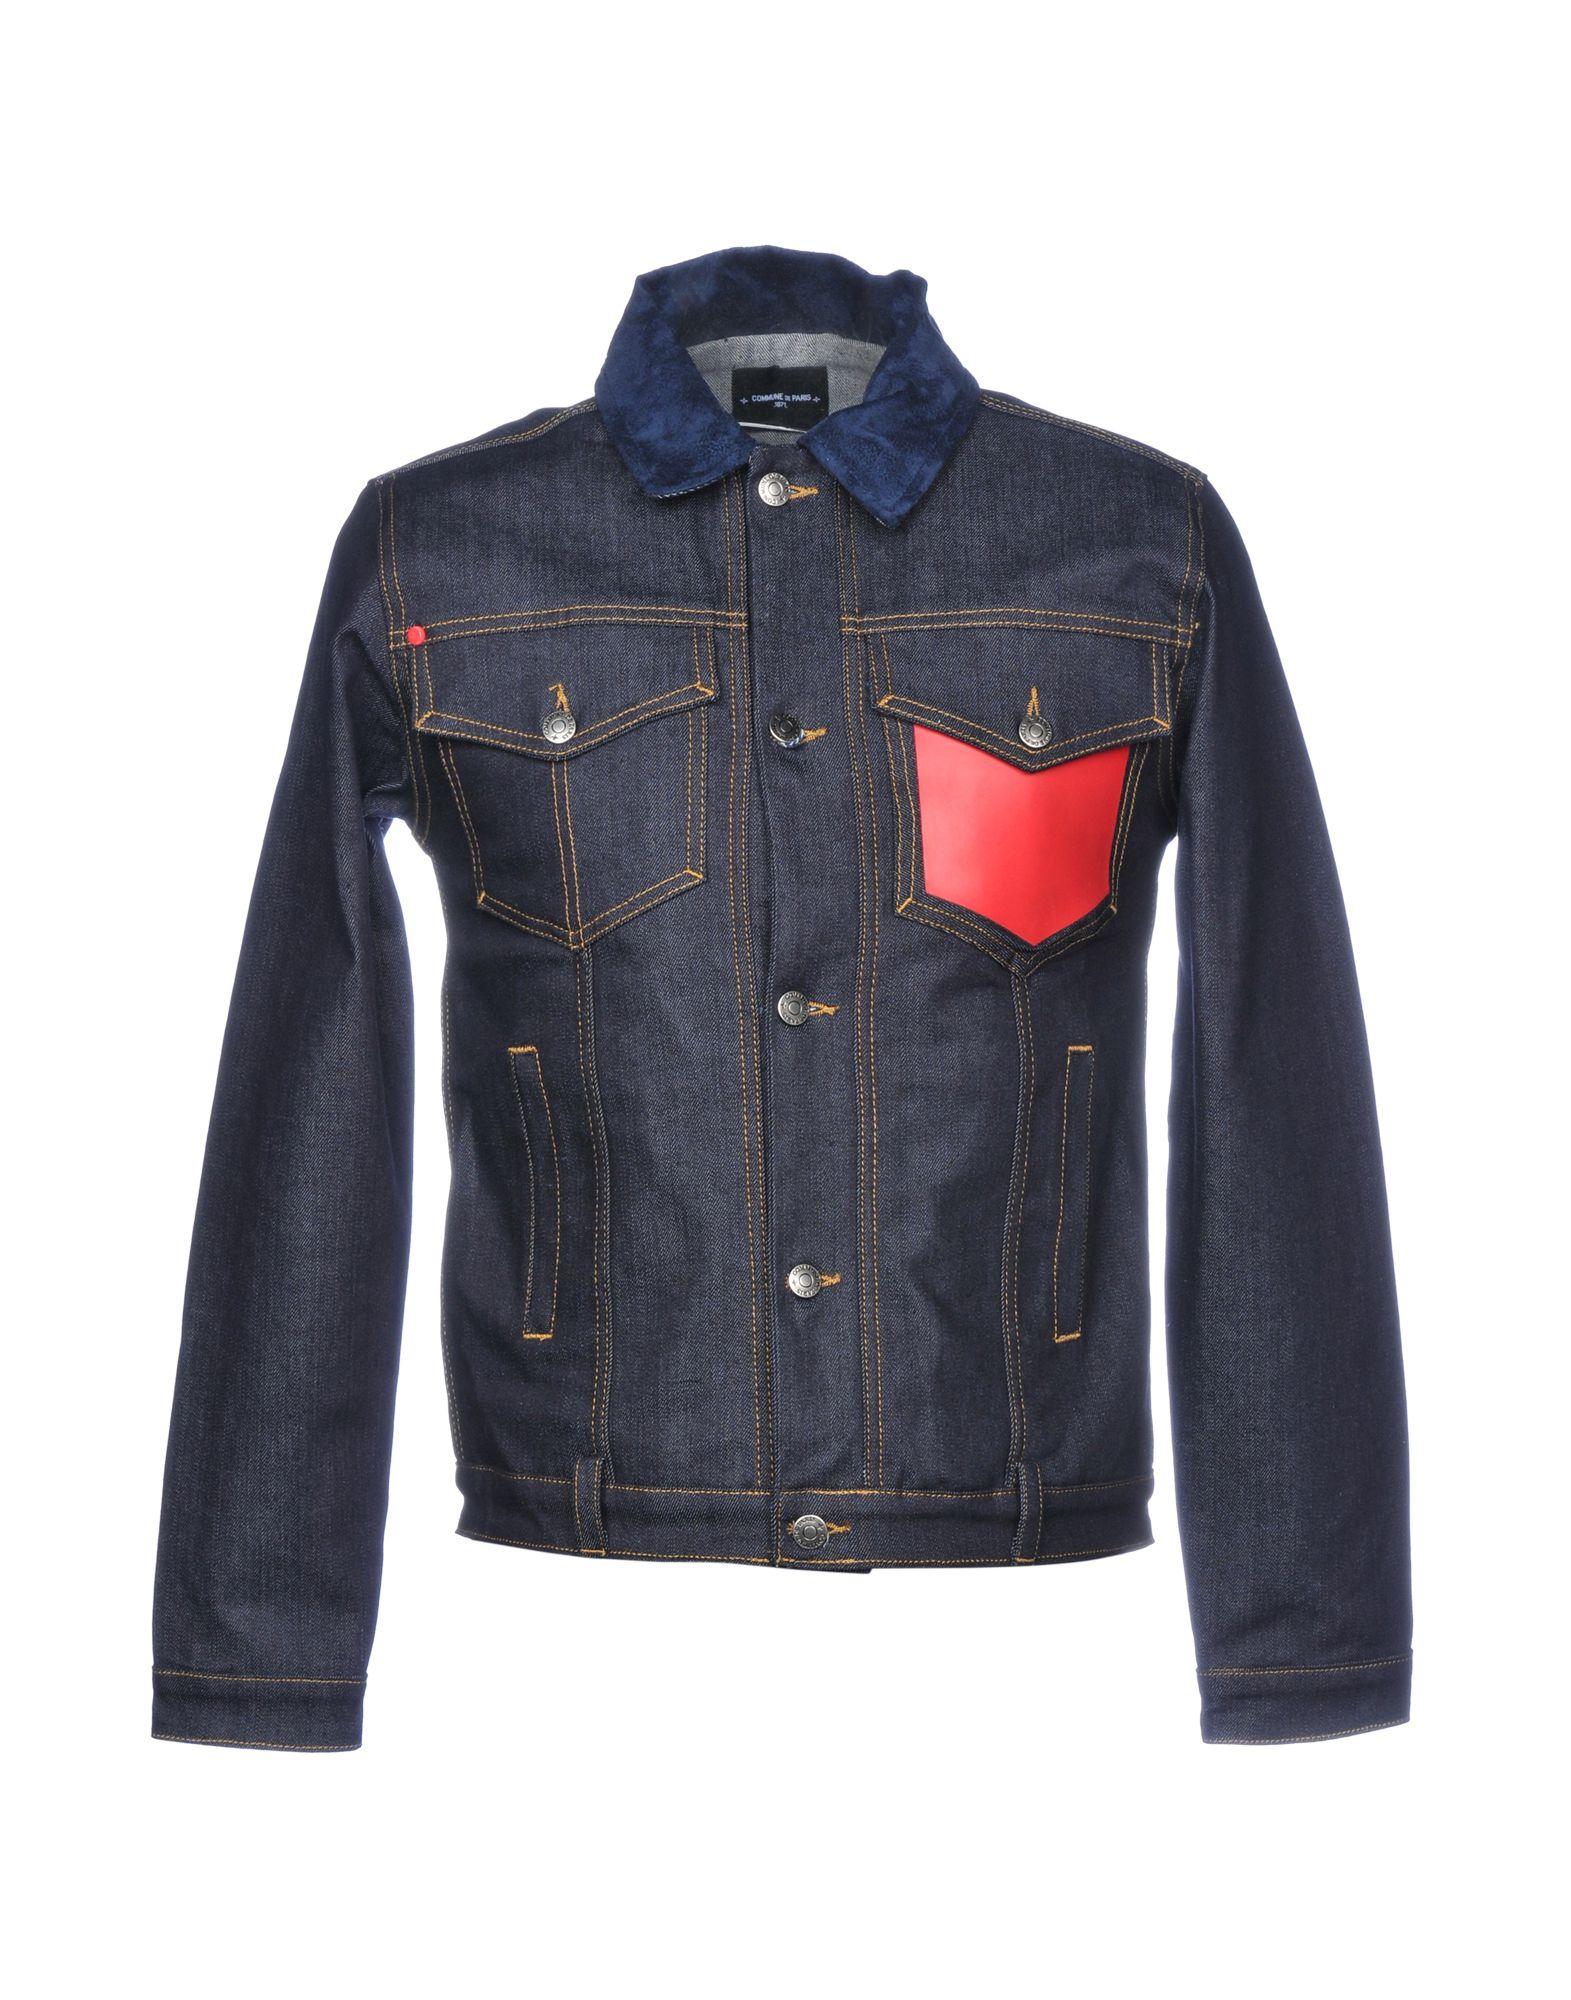 COMMUNE DE PARIS 1871 Джинсовая верхняя одежда commune de paris 1871 dimanches джинсовая рубашка